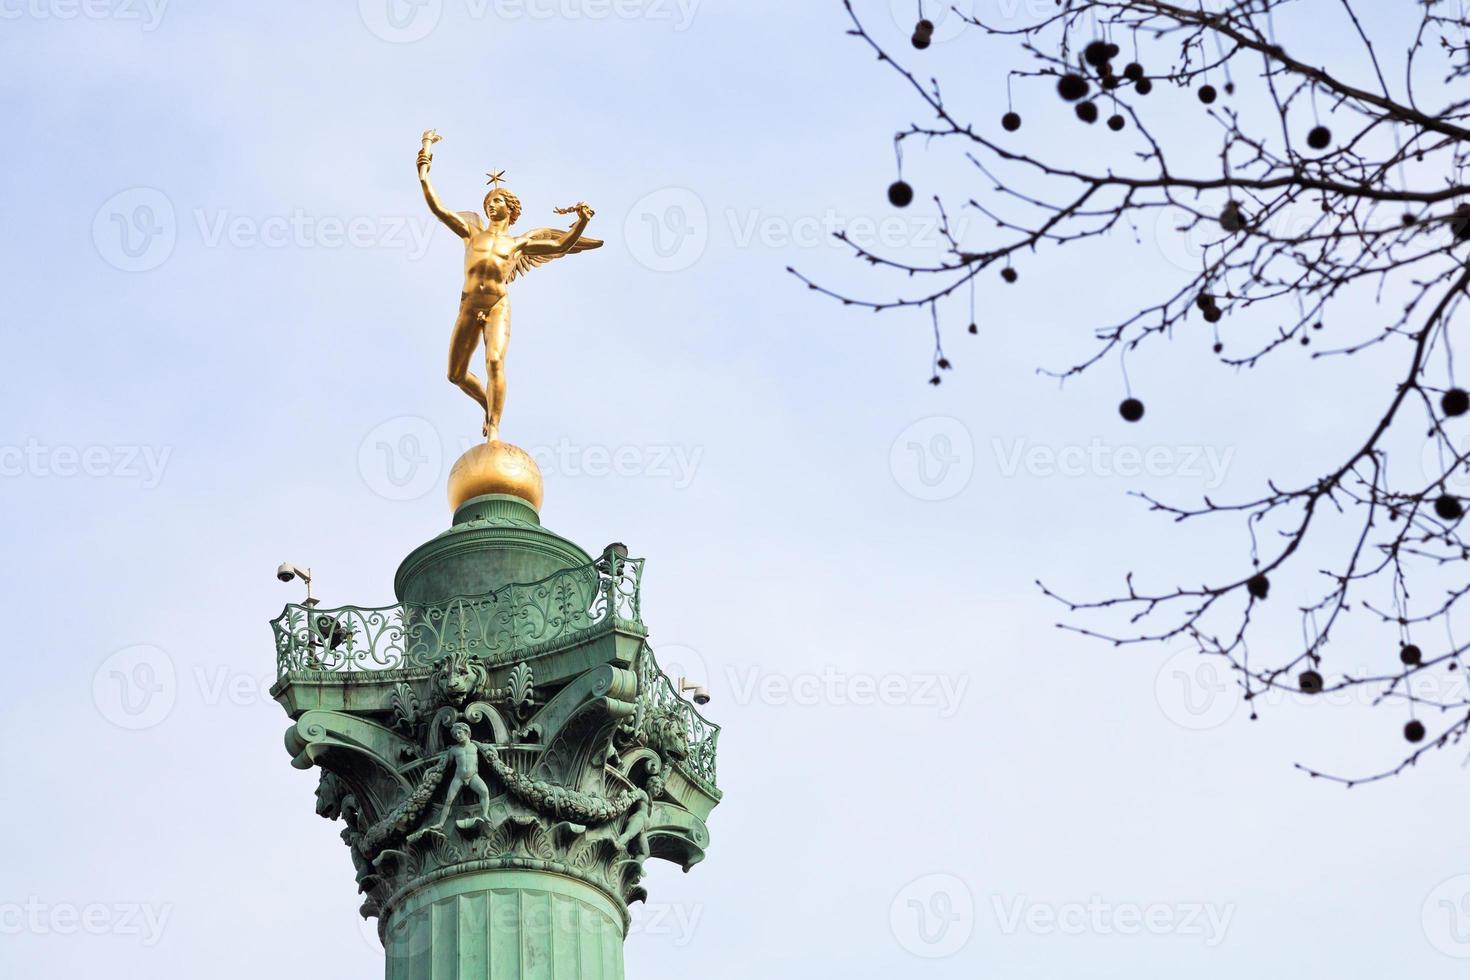 juli kolumn på place de la bastille i Paris foto